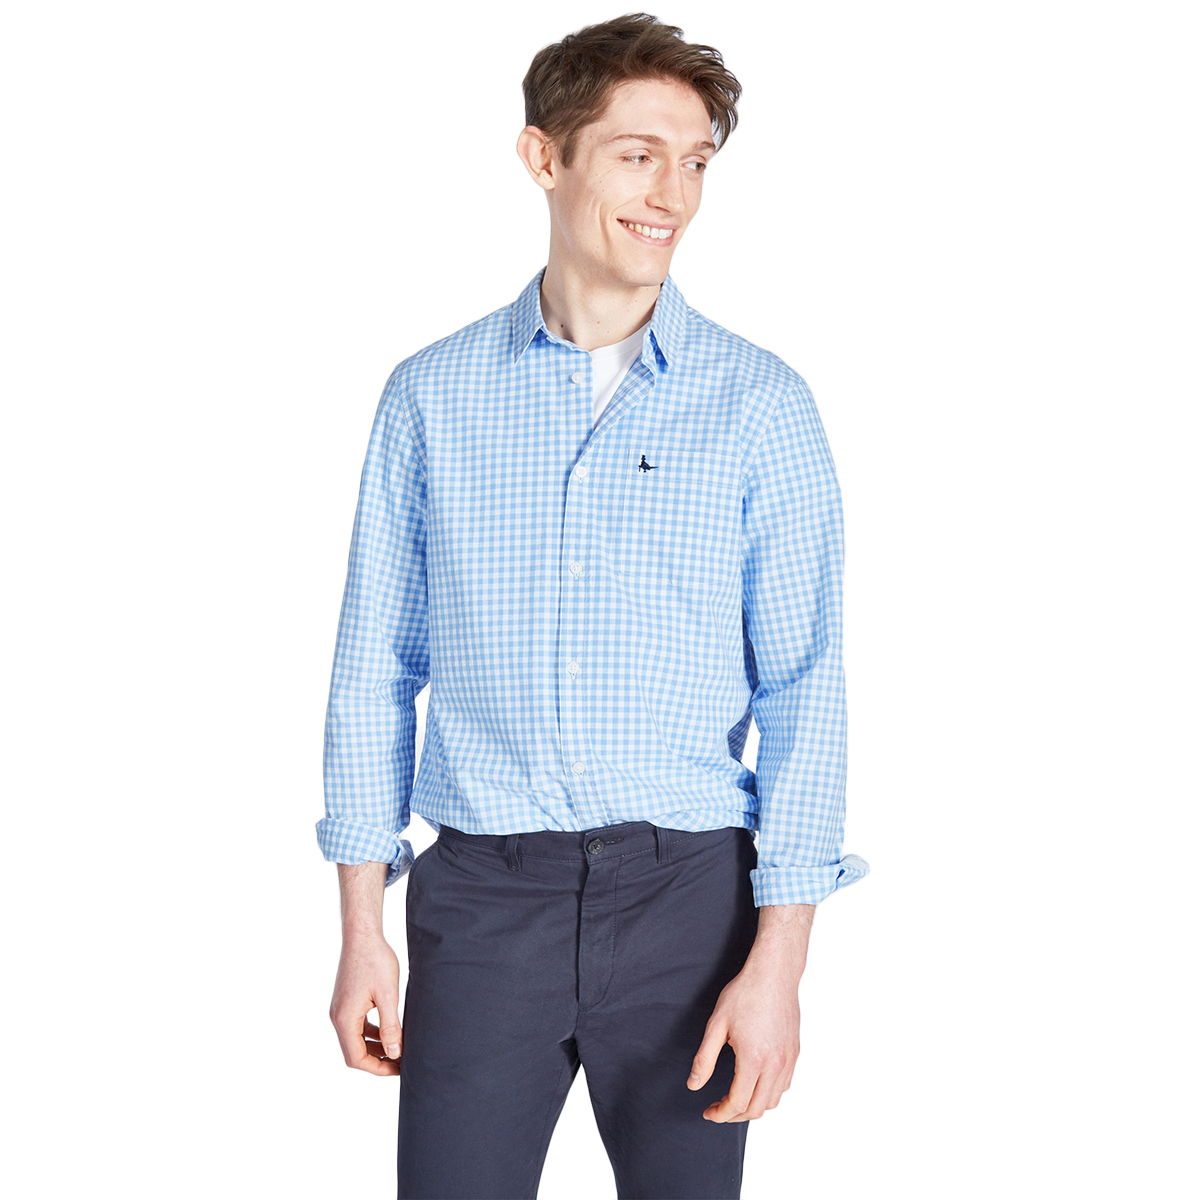 Jack Wills Men's Long-Sleeve Ruxton Poplin Gingham Shirt - Blue, L